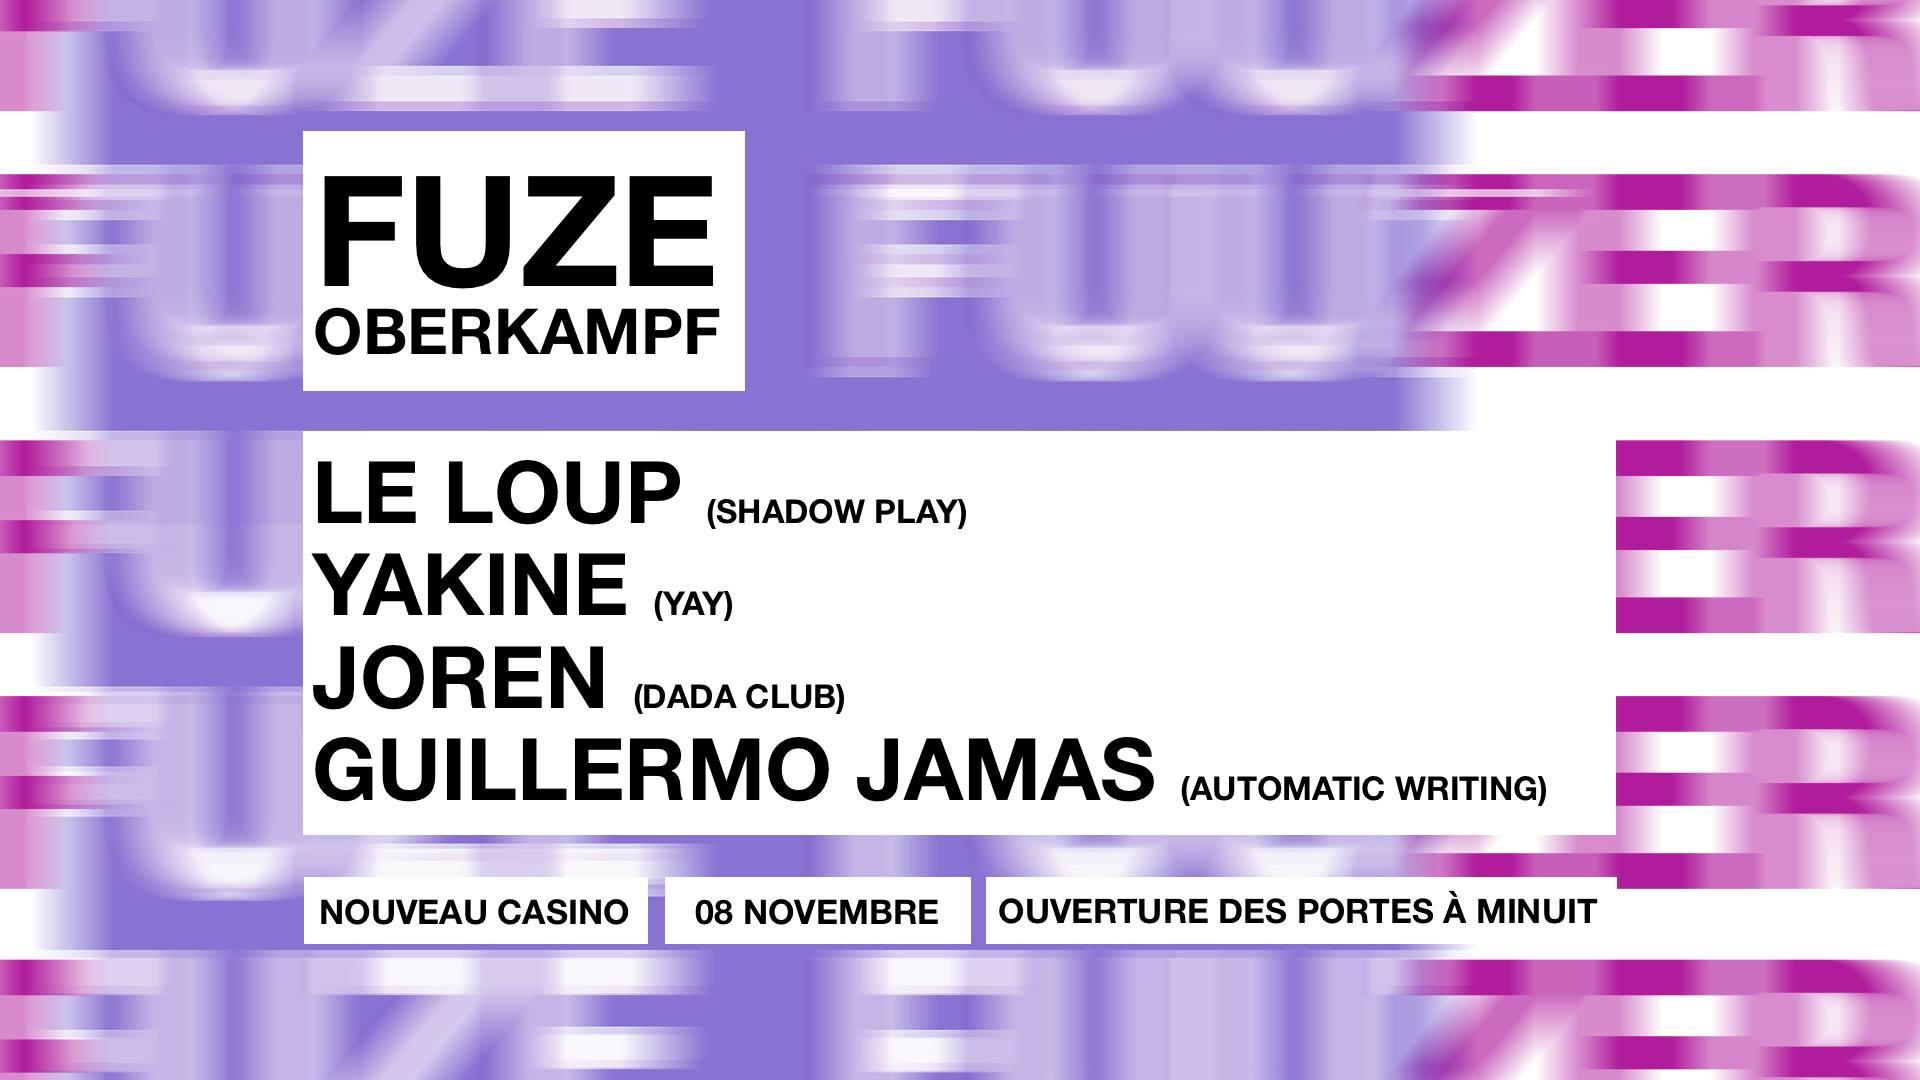 FUZE Oberkampf : Le Loup, Yakine, Joren, Guillermo Jamas